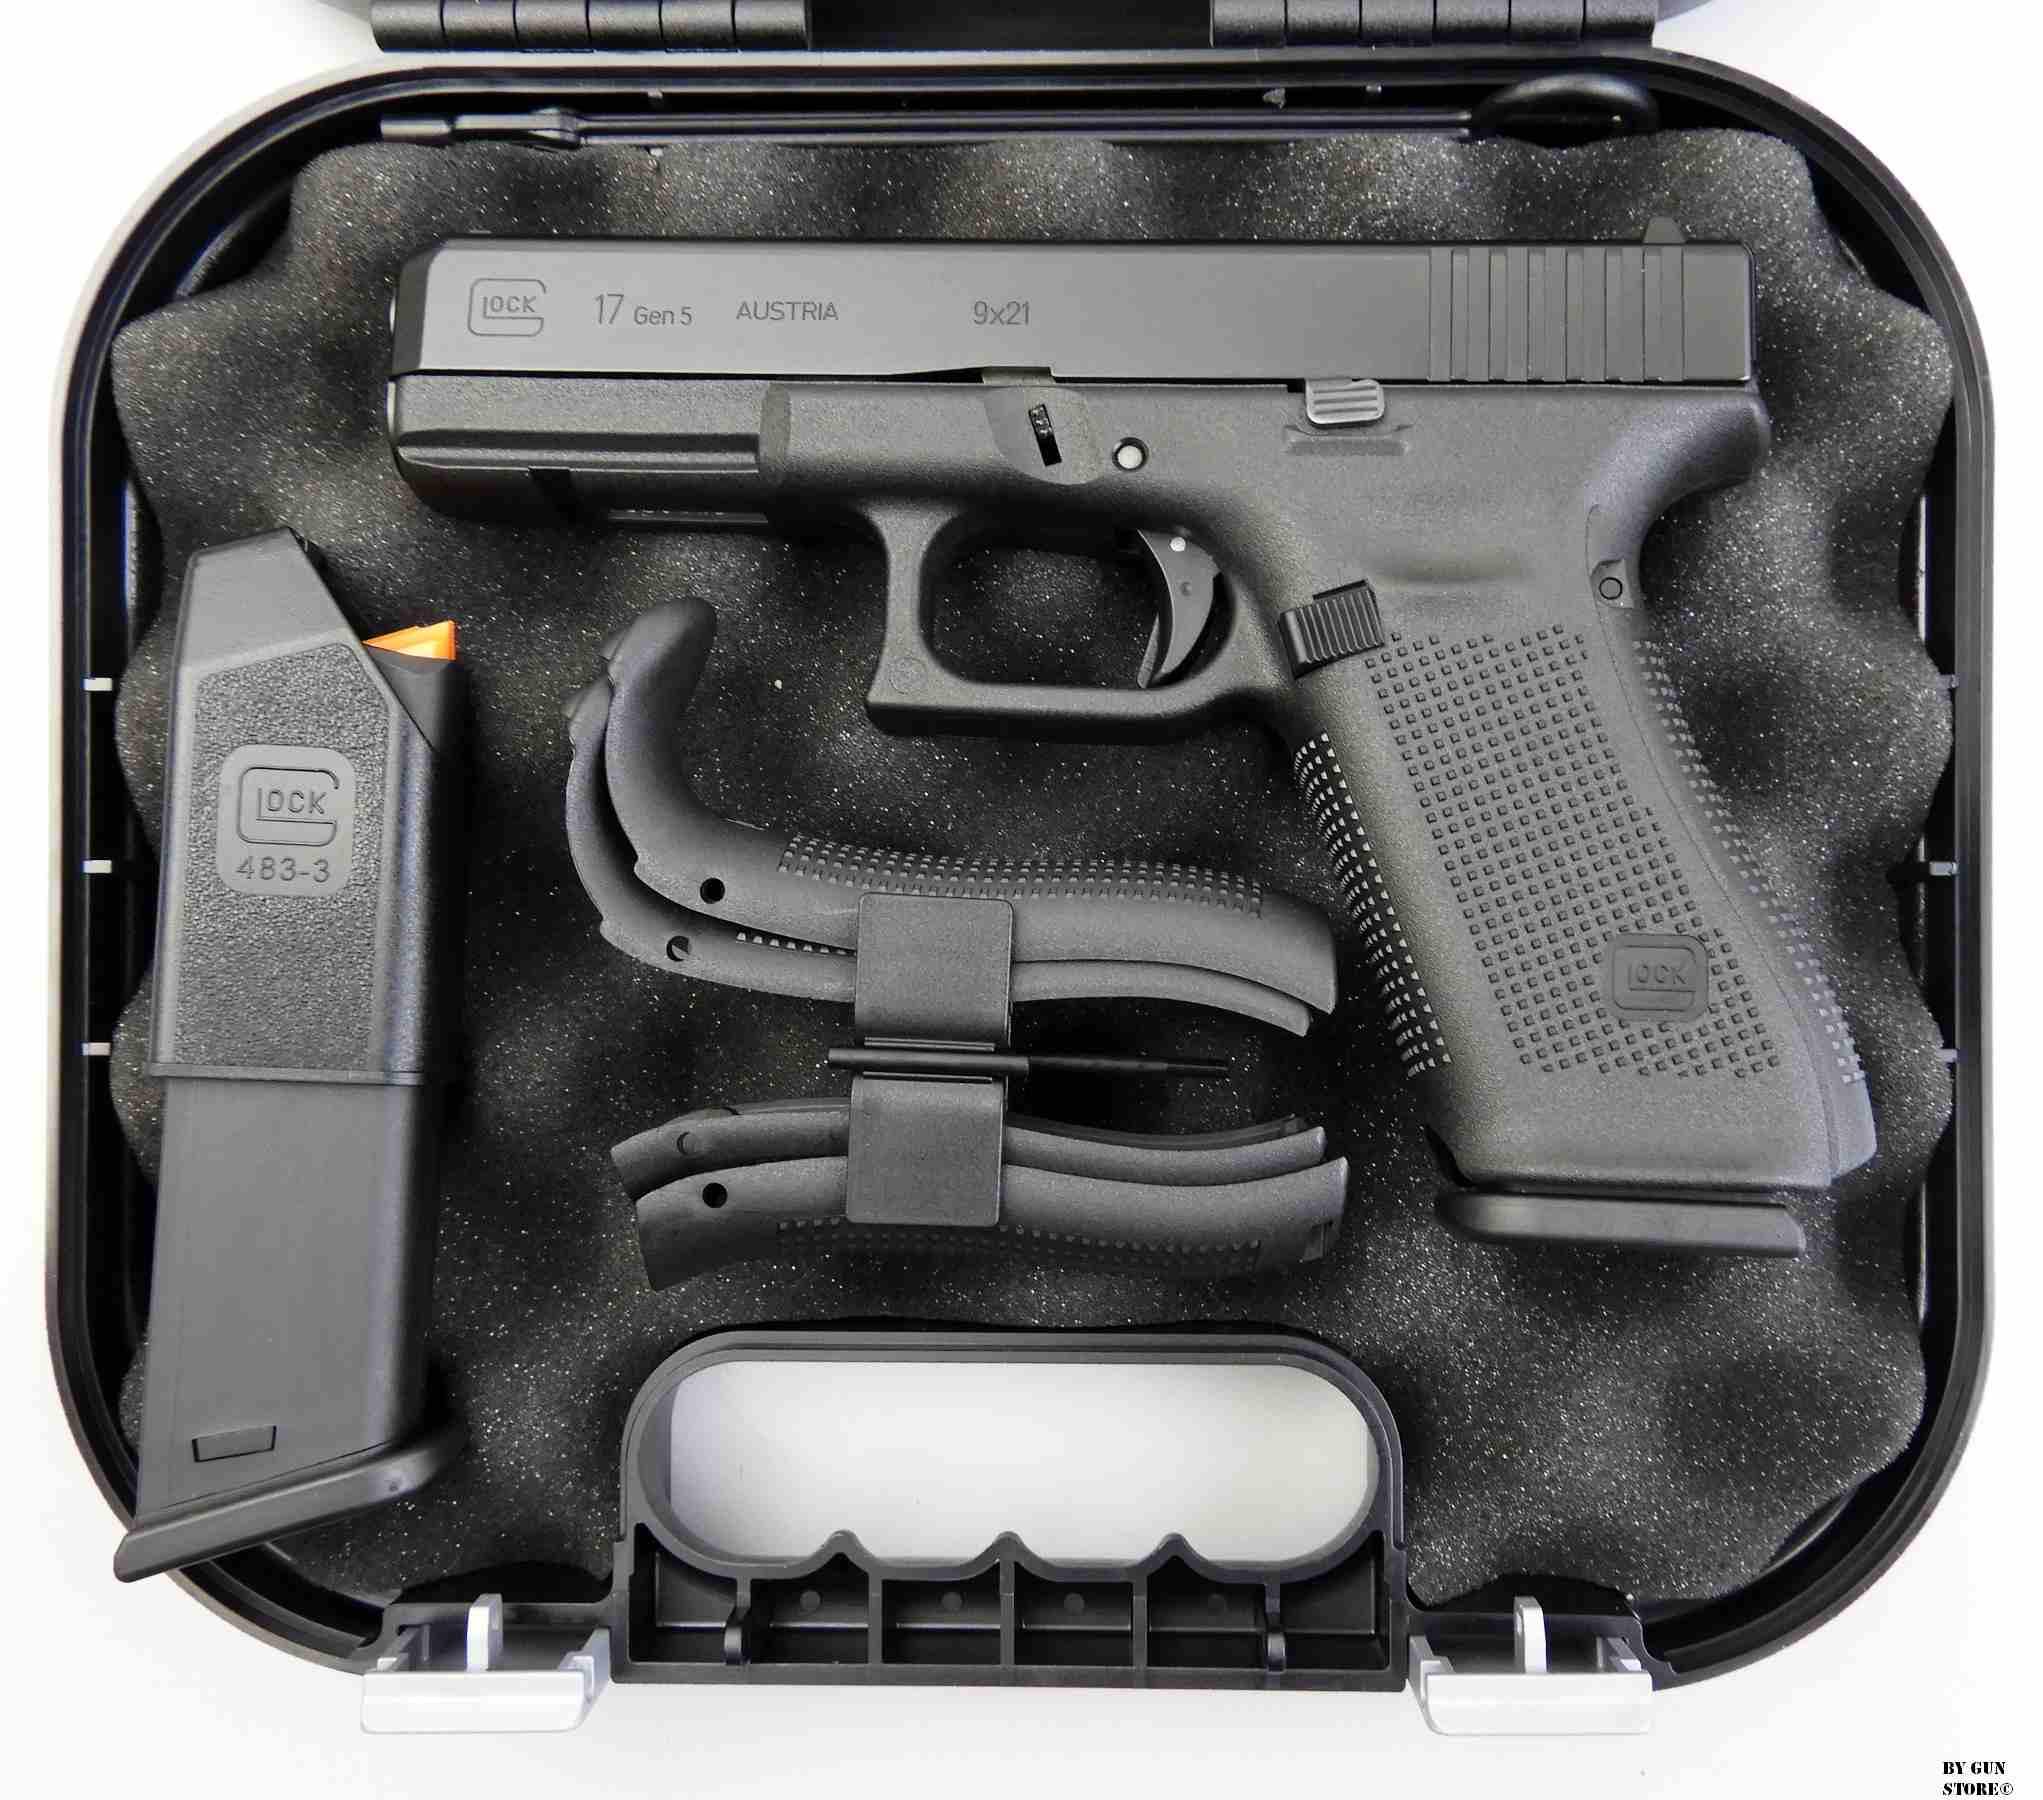 Gun Store Bunker Ego Sum Bellum Pistola Glock Mod 17 Gen V Cal